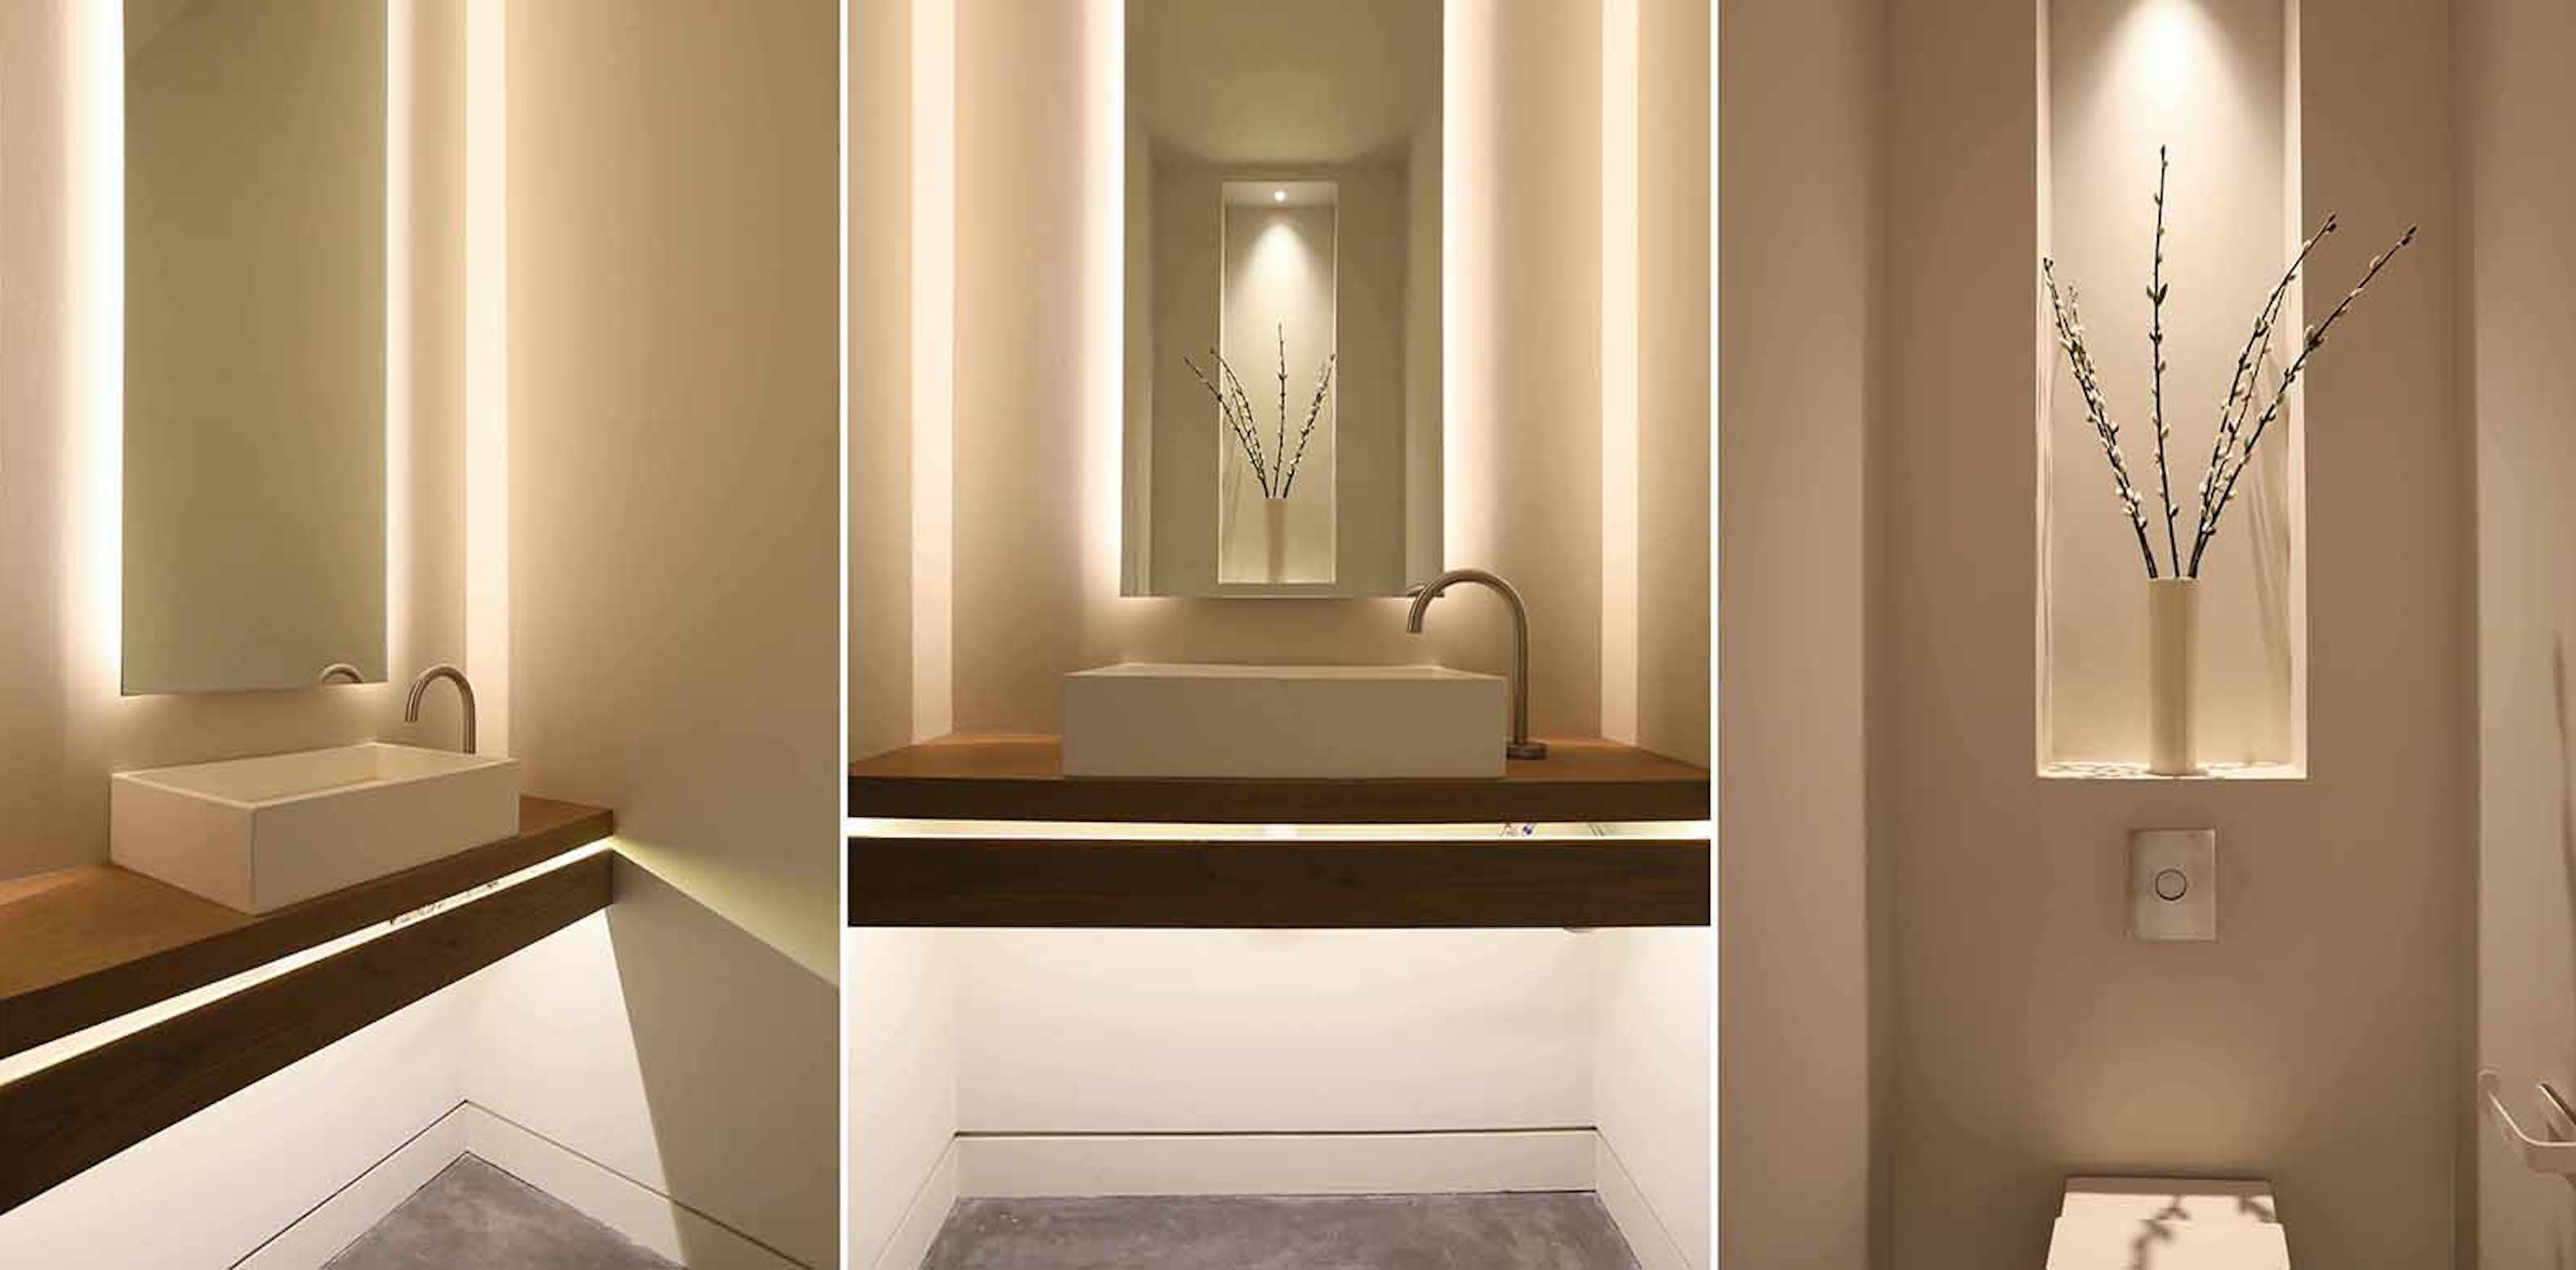 Cloakroom bathroom lighting